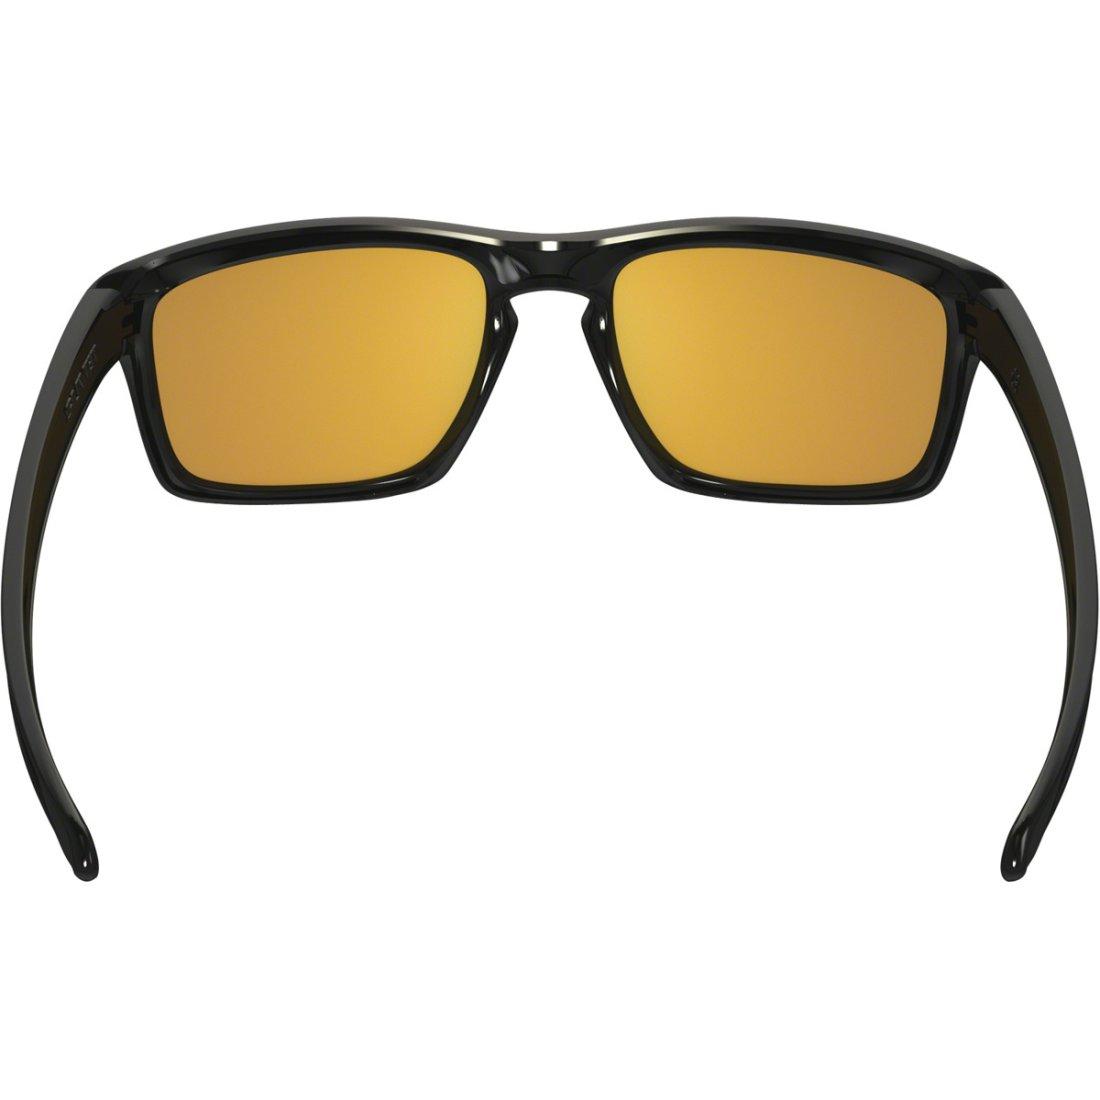 1a0a575eaaa OAKLEY Sliver Polished Black   24K Iridium Sun glasses · Motocard